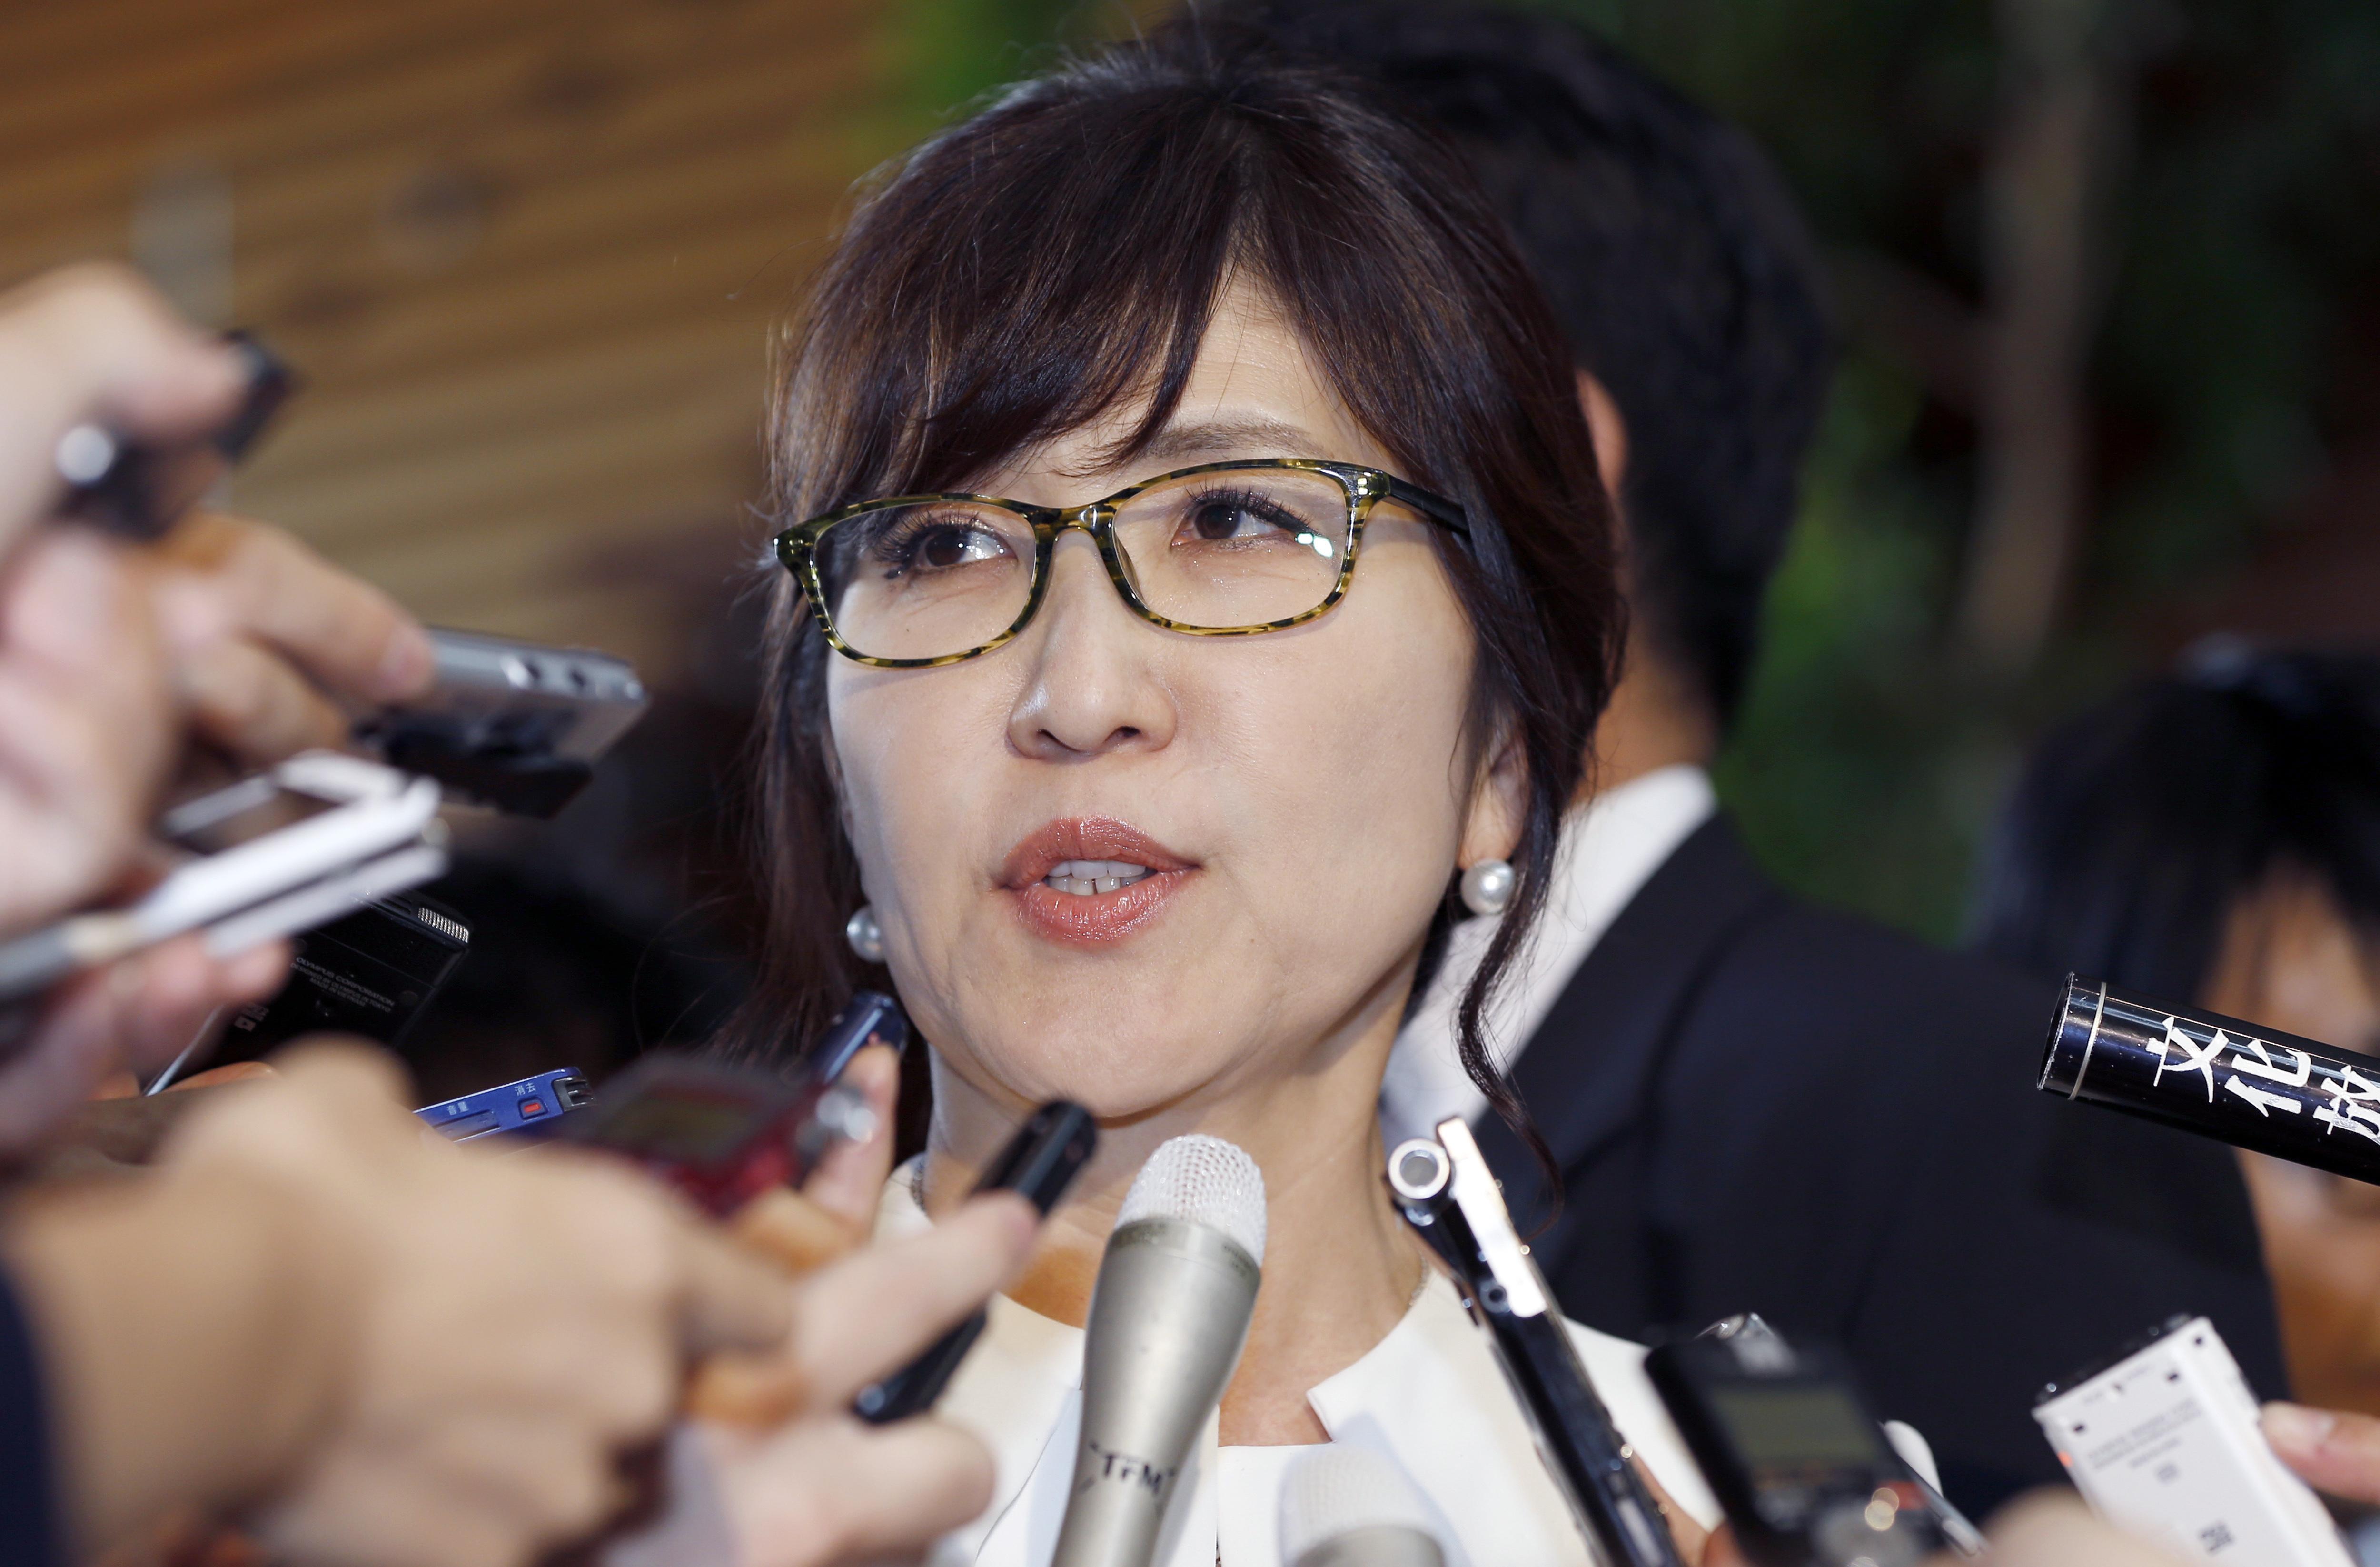 Japan picks defense chief who downplays wartime past - Washington Times